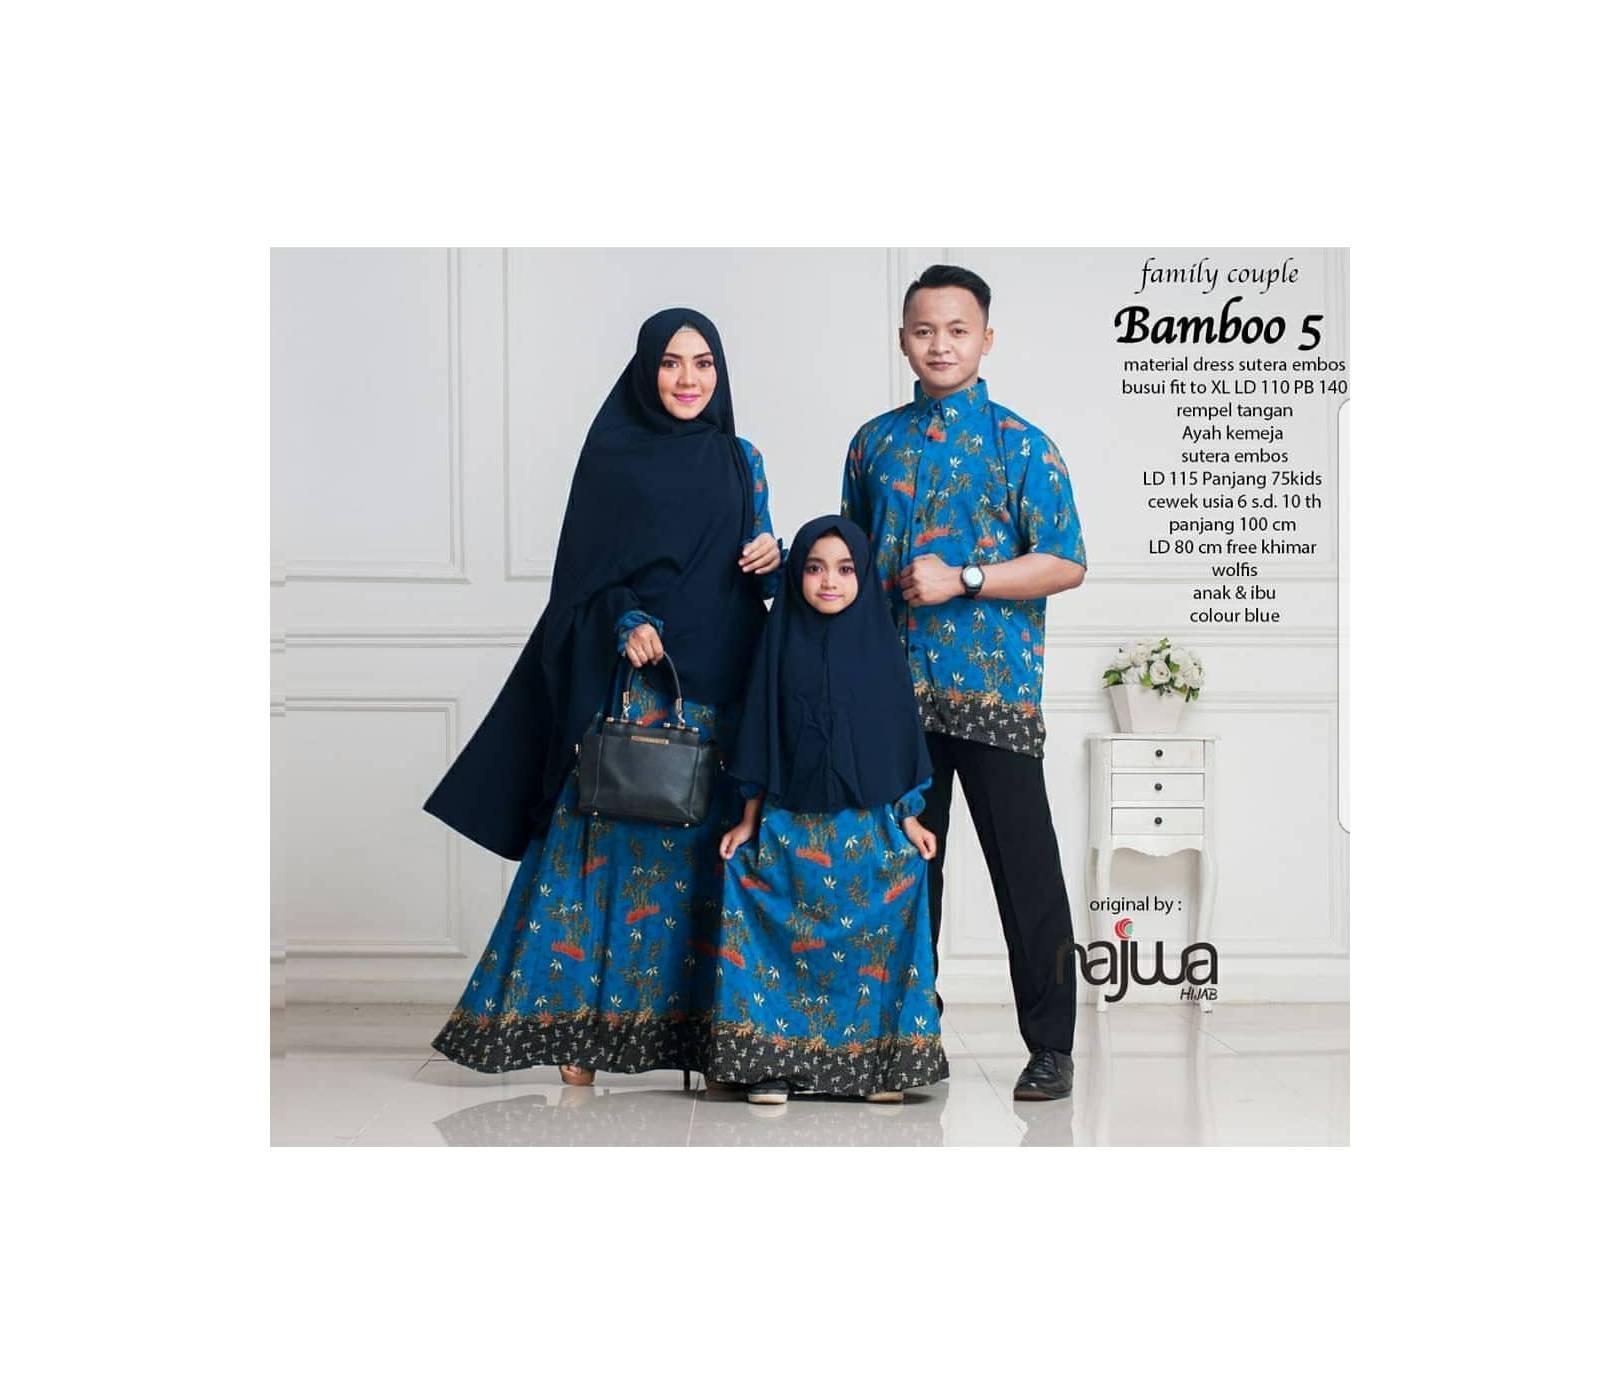 baju muslim syari lebaran couple sarimbitan batik ayah ibu anak